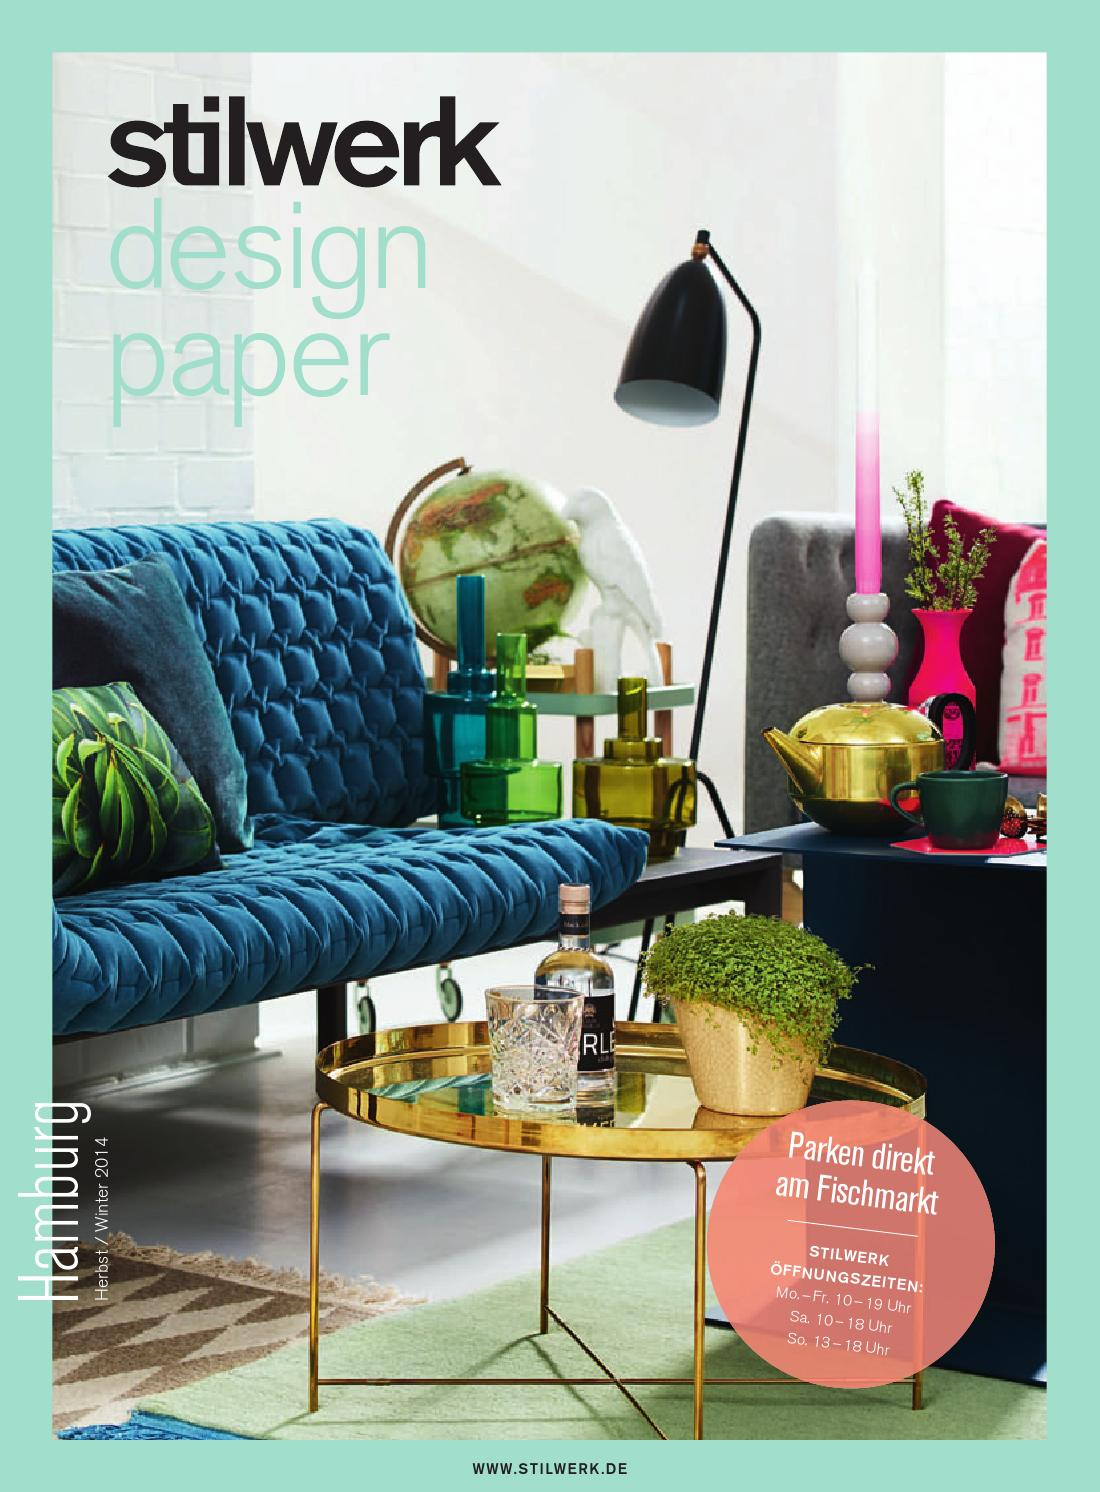 stilwerk design paper hamburg herbst winter 2014 by stilwerk issuu. Black Bedroom Furniture Sets. Home Design Ideas